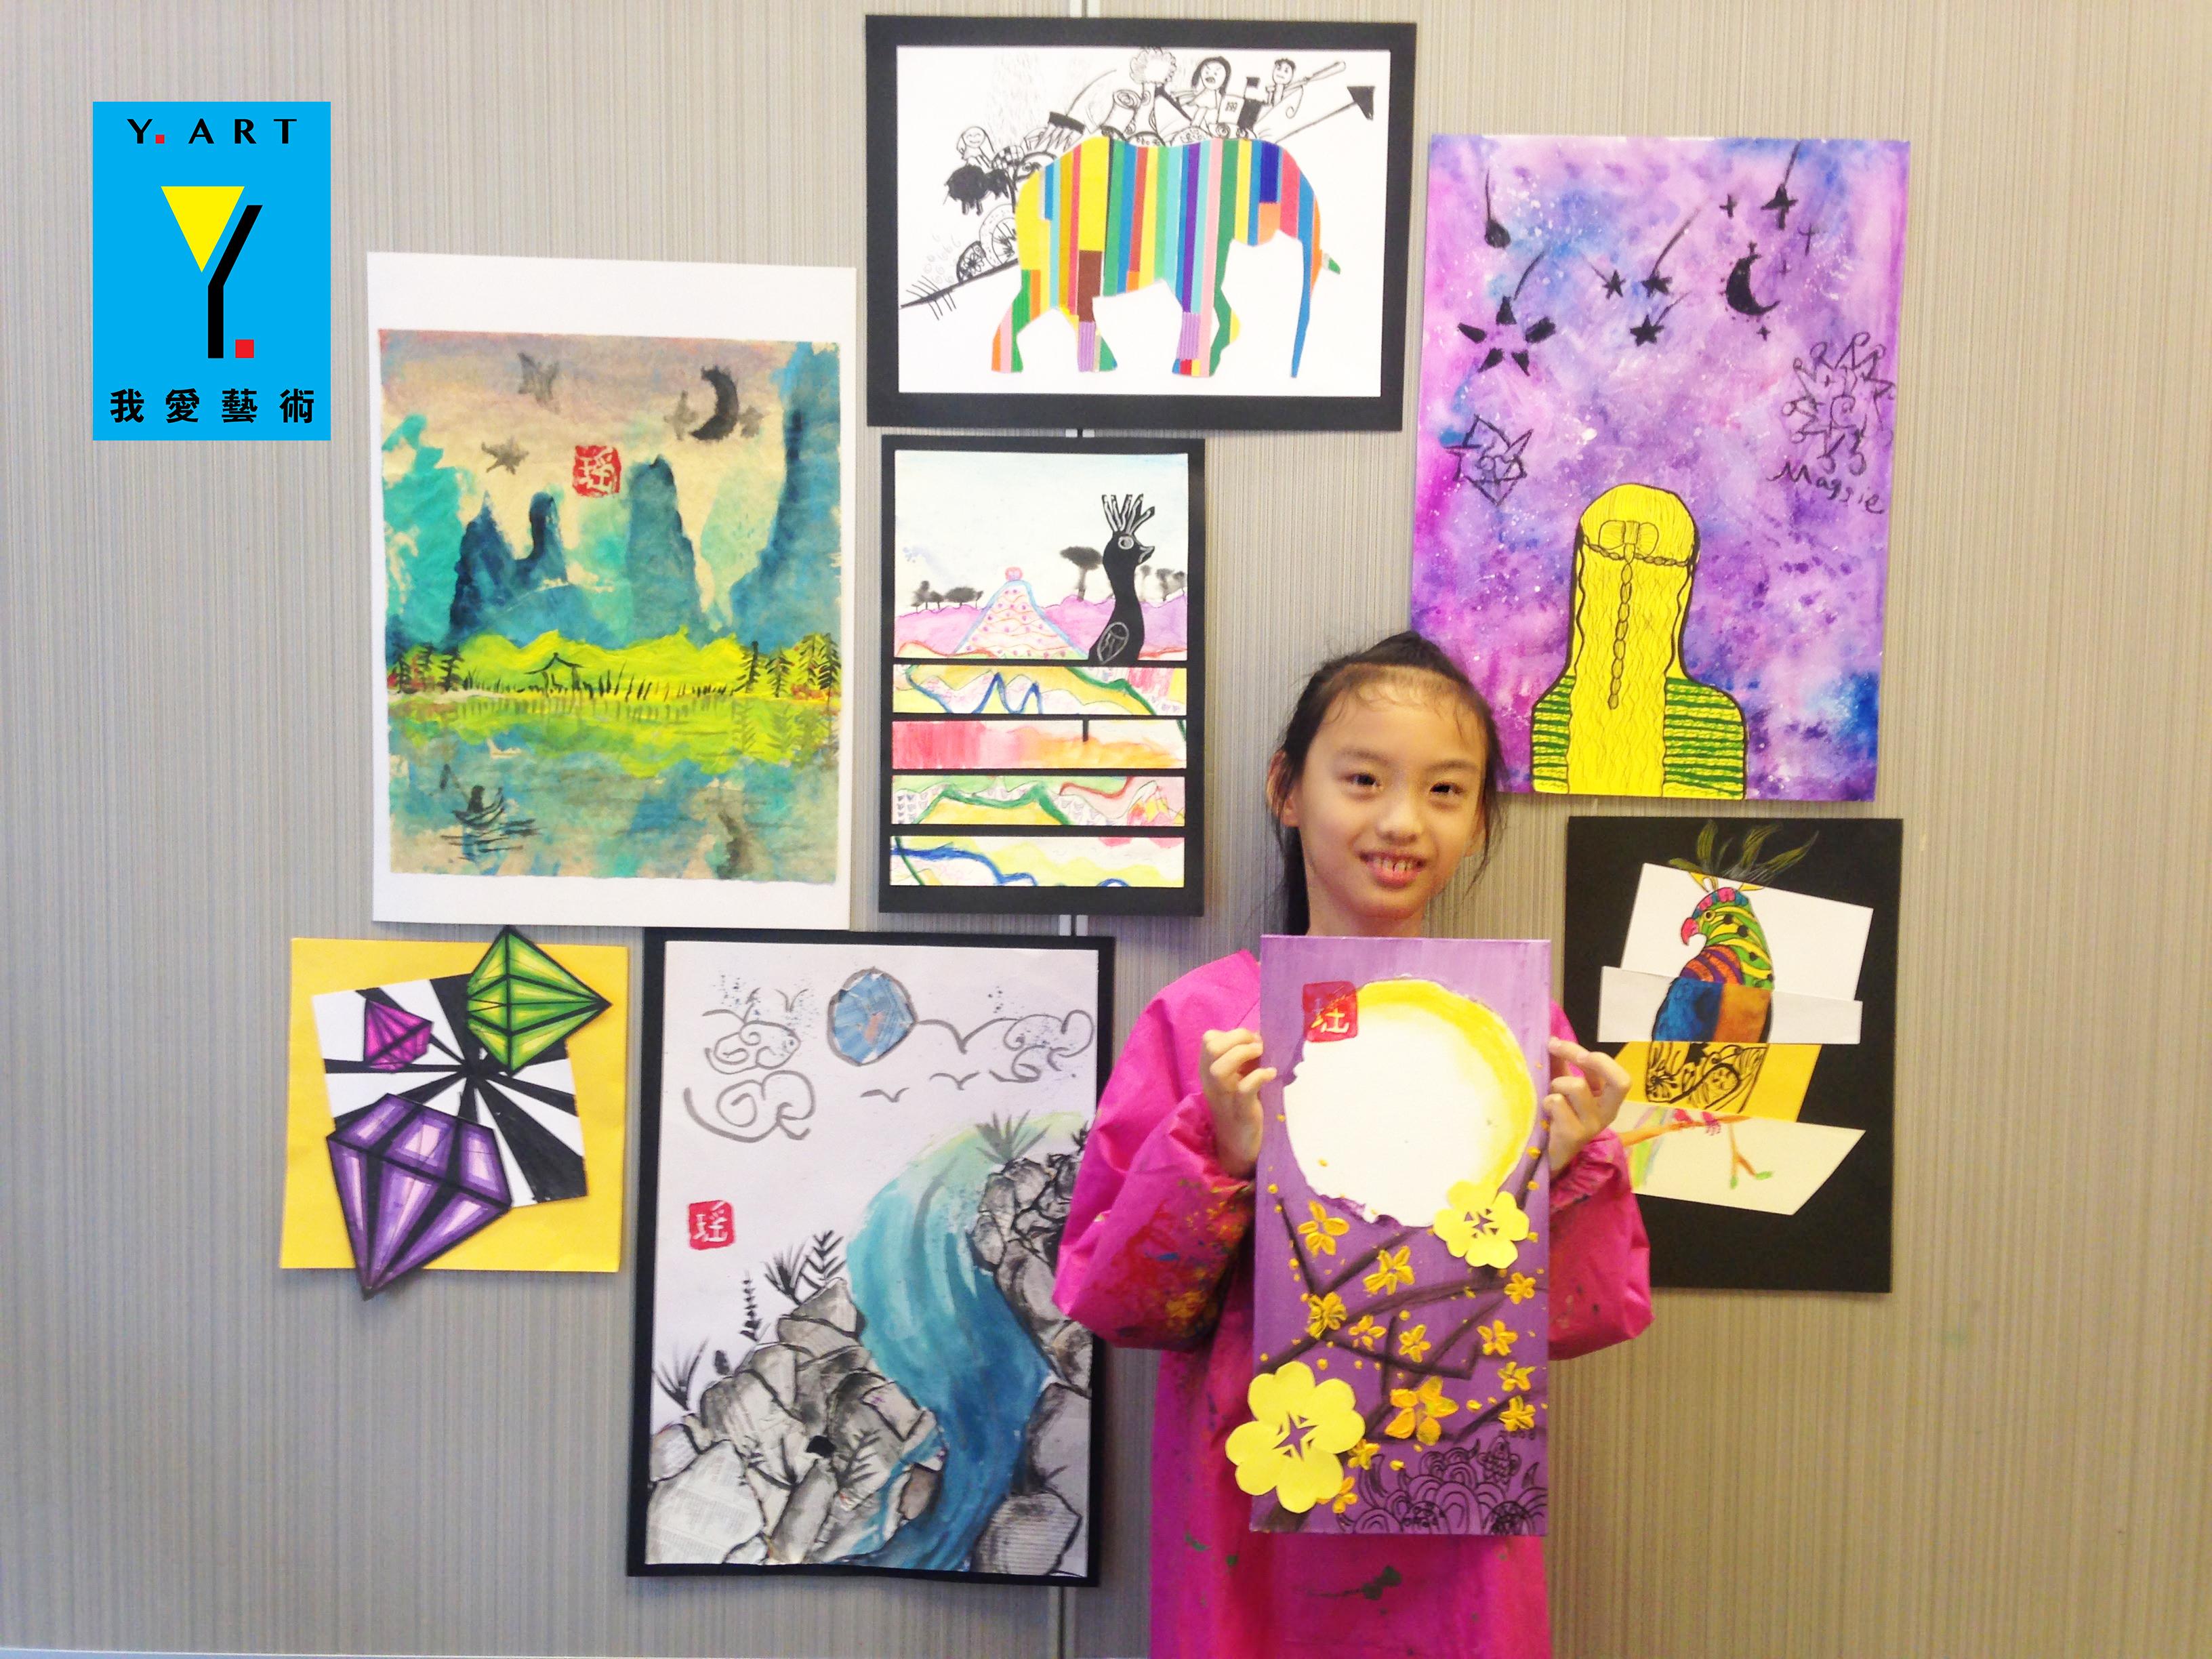 Student's artwork